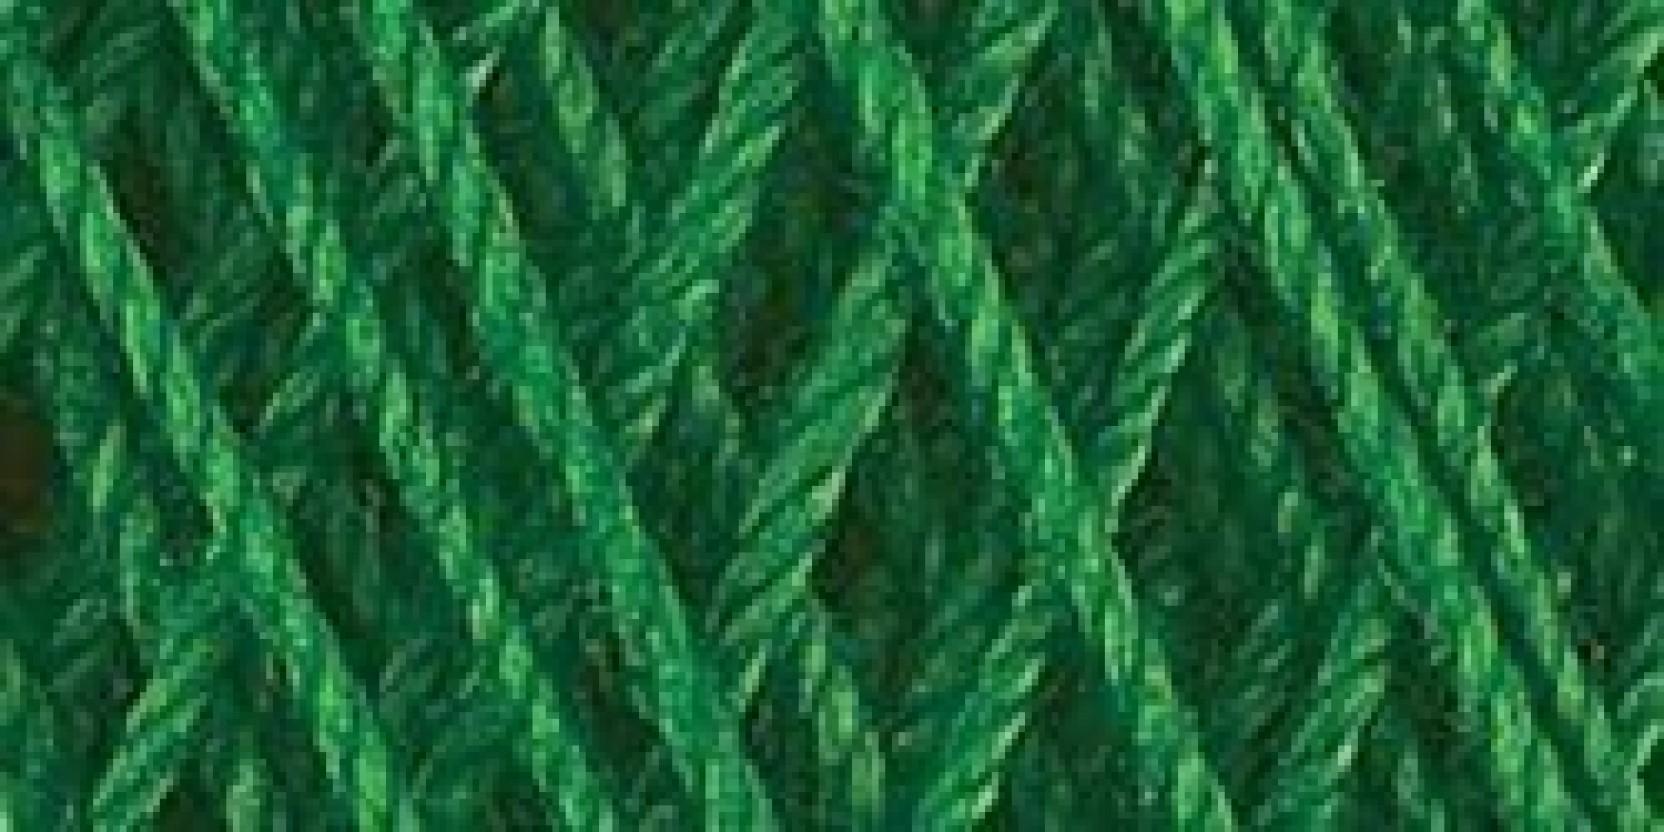 Coats Crochet South Maid Crochet Cotton Thread Size 10 Myrtle